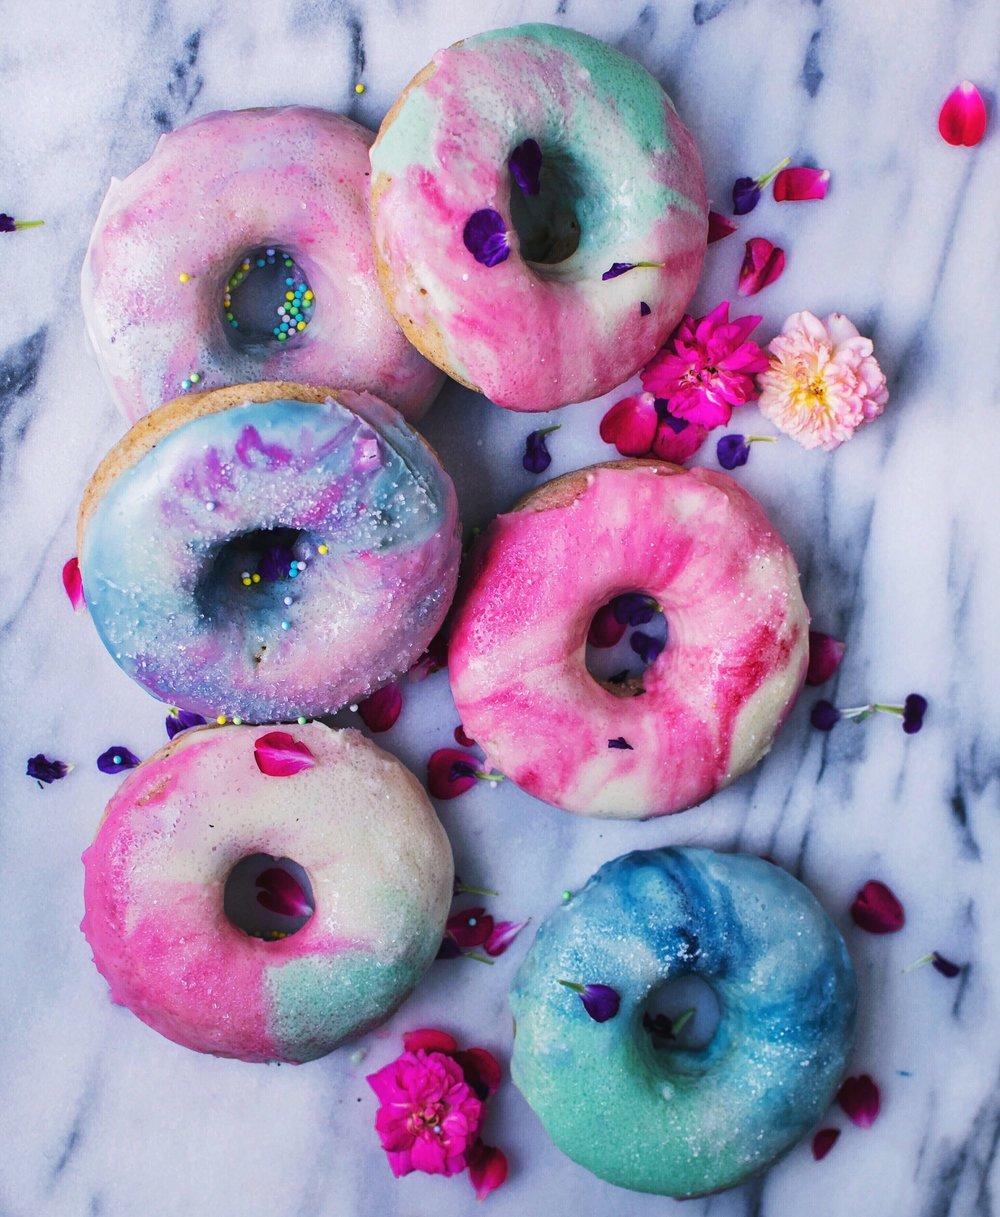 vegan glazed donuts icing